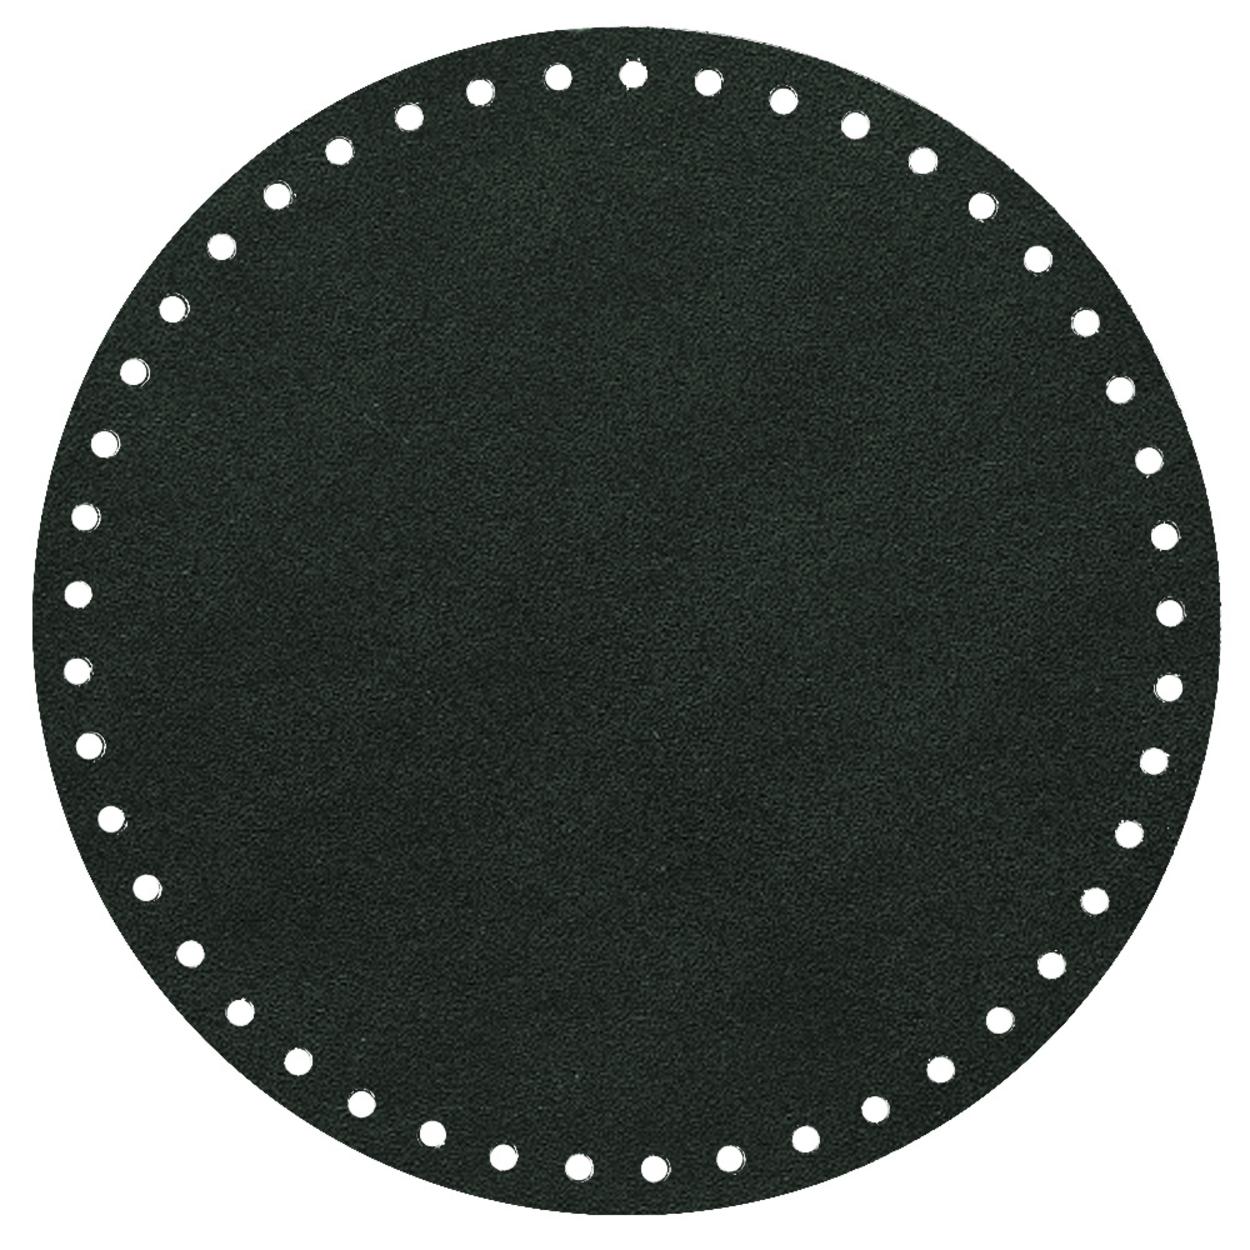 Кожа - Дно для сумки круглое 20 см. Dark green